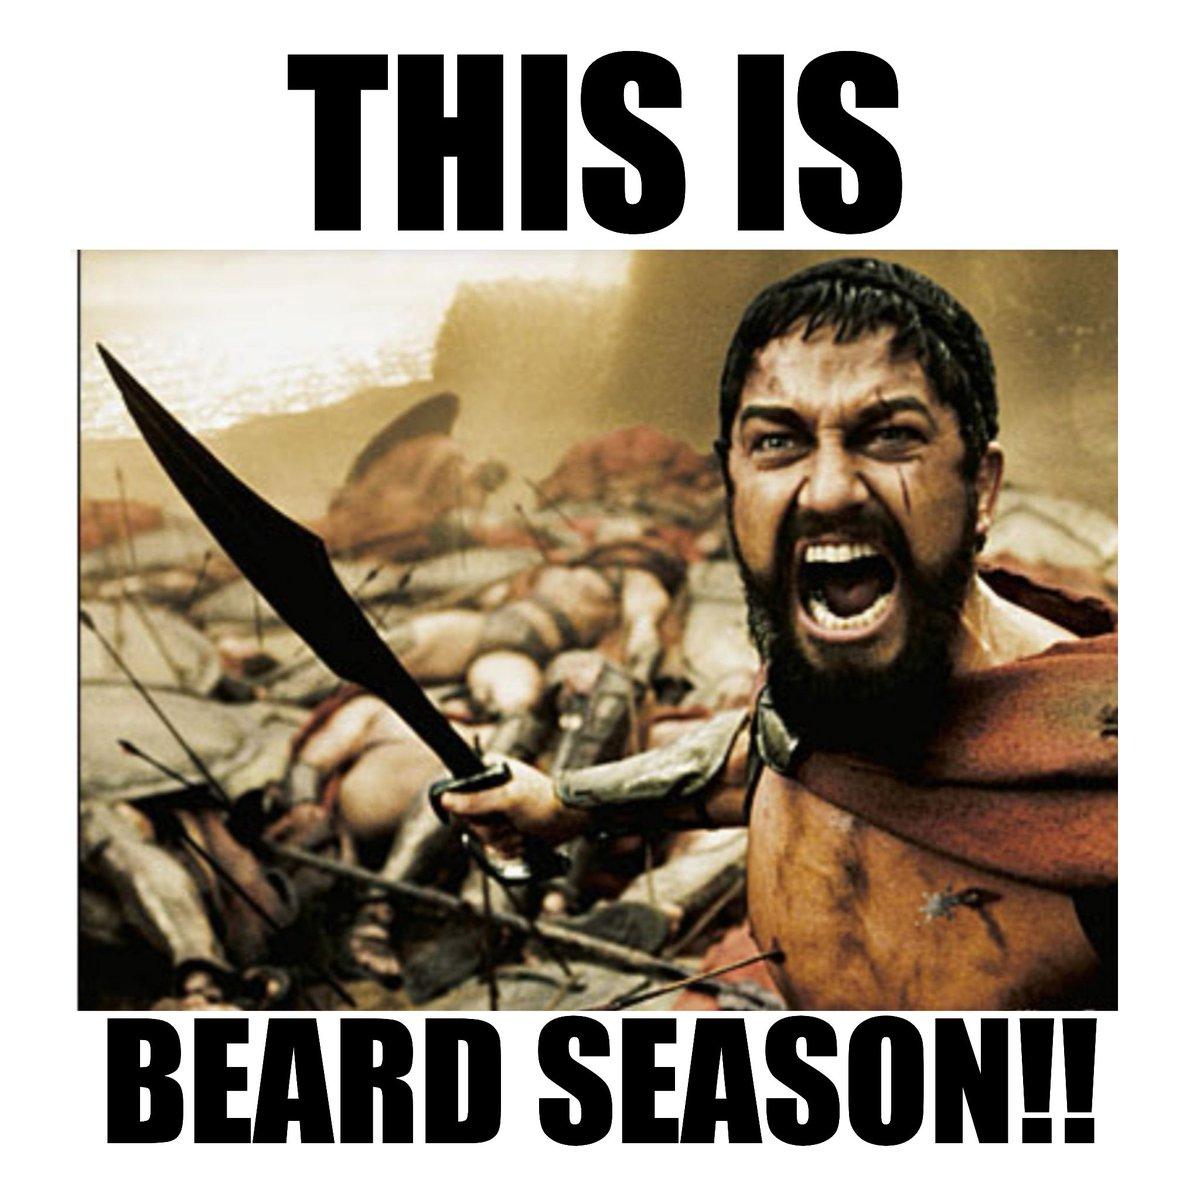 The bearded men liberators  #𝘁𝗲𝗮𝗺𝗯𝗲𝗮𝗿𝗱𝗮𝗵𝗼𝗹𝗶𝗰𝘀  #spartanstrong #mypassion #mybeard #beardseason  #beardedlife #grooming #beardaholics #beardbalm #beardbutter #beardoil #veganbeardbalm #beardaholic  #beardcare… https://www.instagram.com/p/BzCORsdFleG/?igshid=1q2m3dvdcf7jn…pic.twitter.com/WKnMFRvdy5